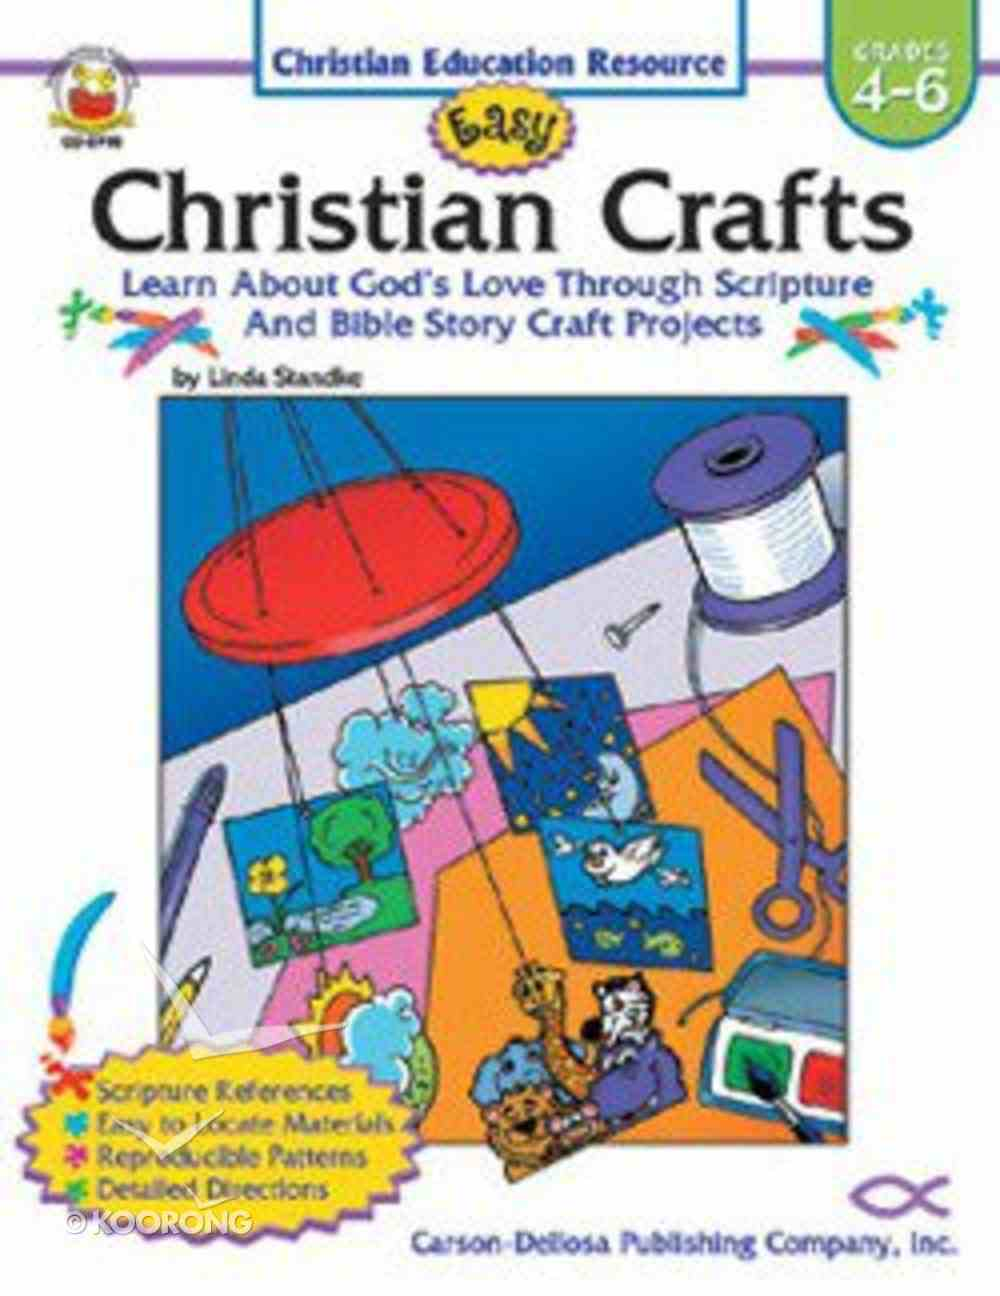 Easy Christian Crafts Reproducible (Grades 4-6) Paperback